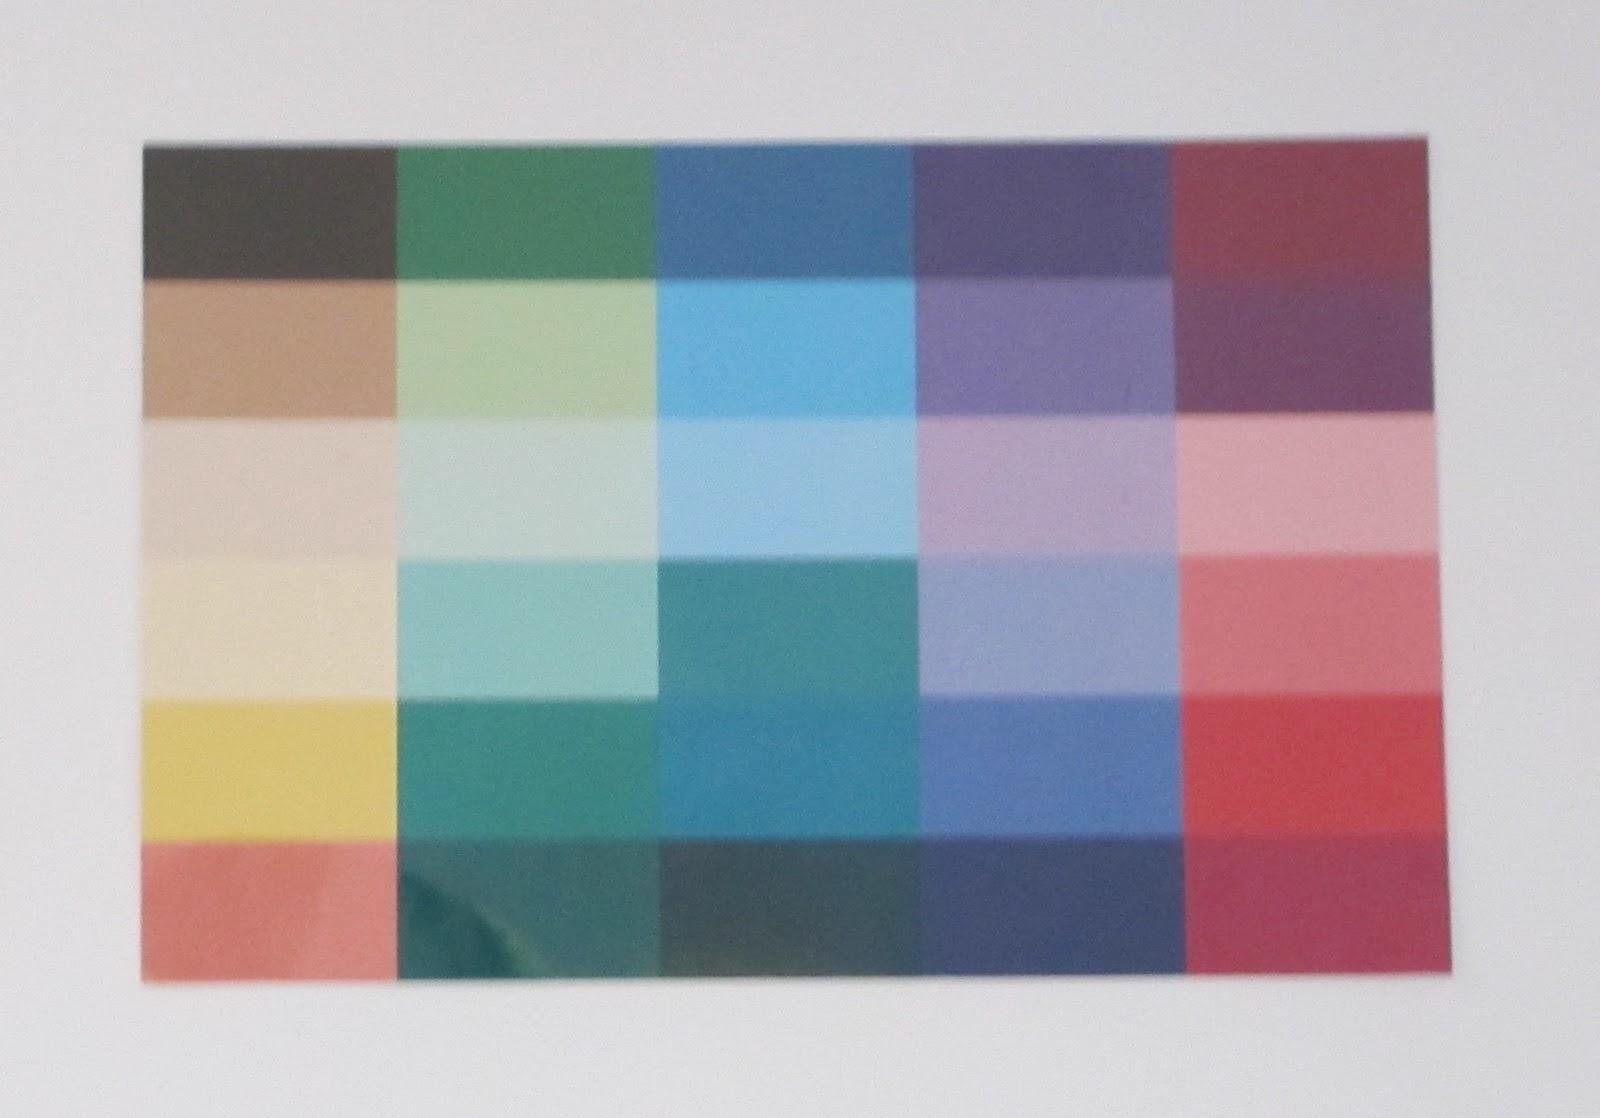 Over 60 and over here!: Seasonal colour analysis vs